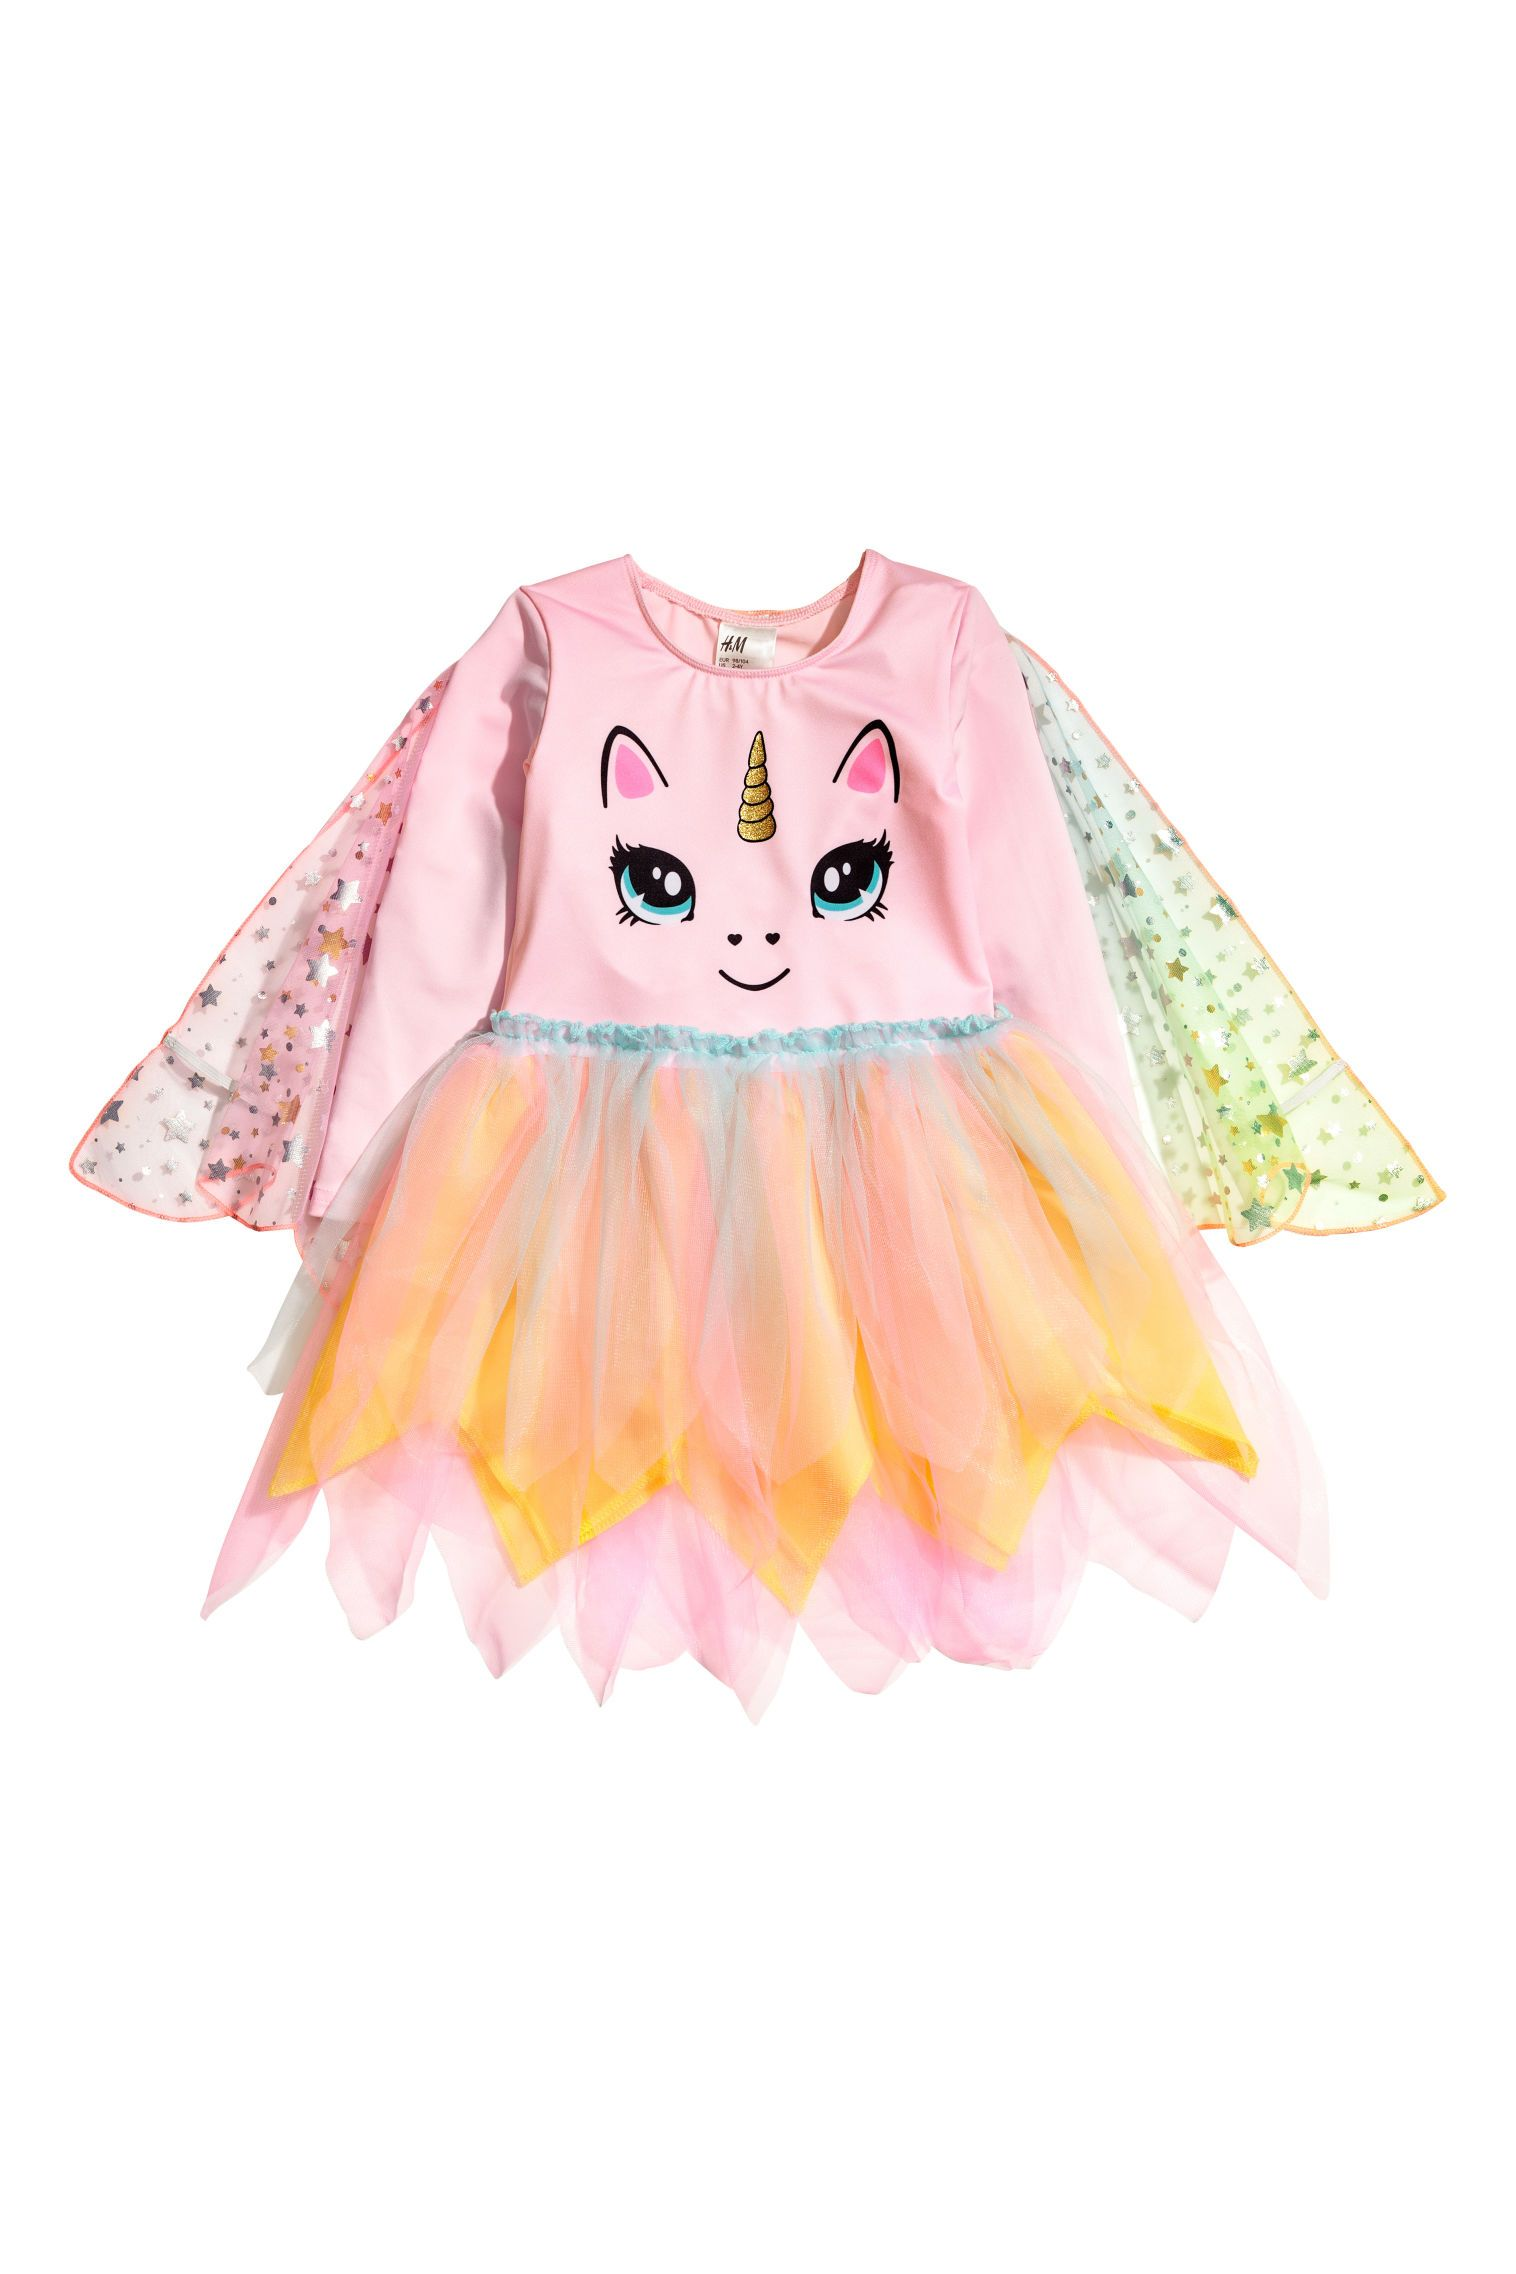 2a919948ecbc Fancy dress costume with cape | الصورة الرمزية | Unicorn dress ...